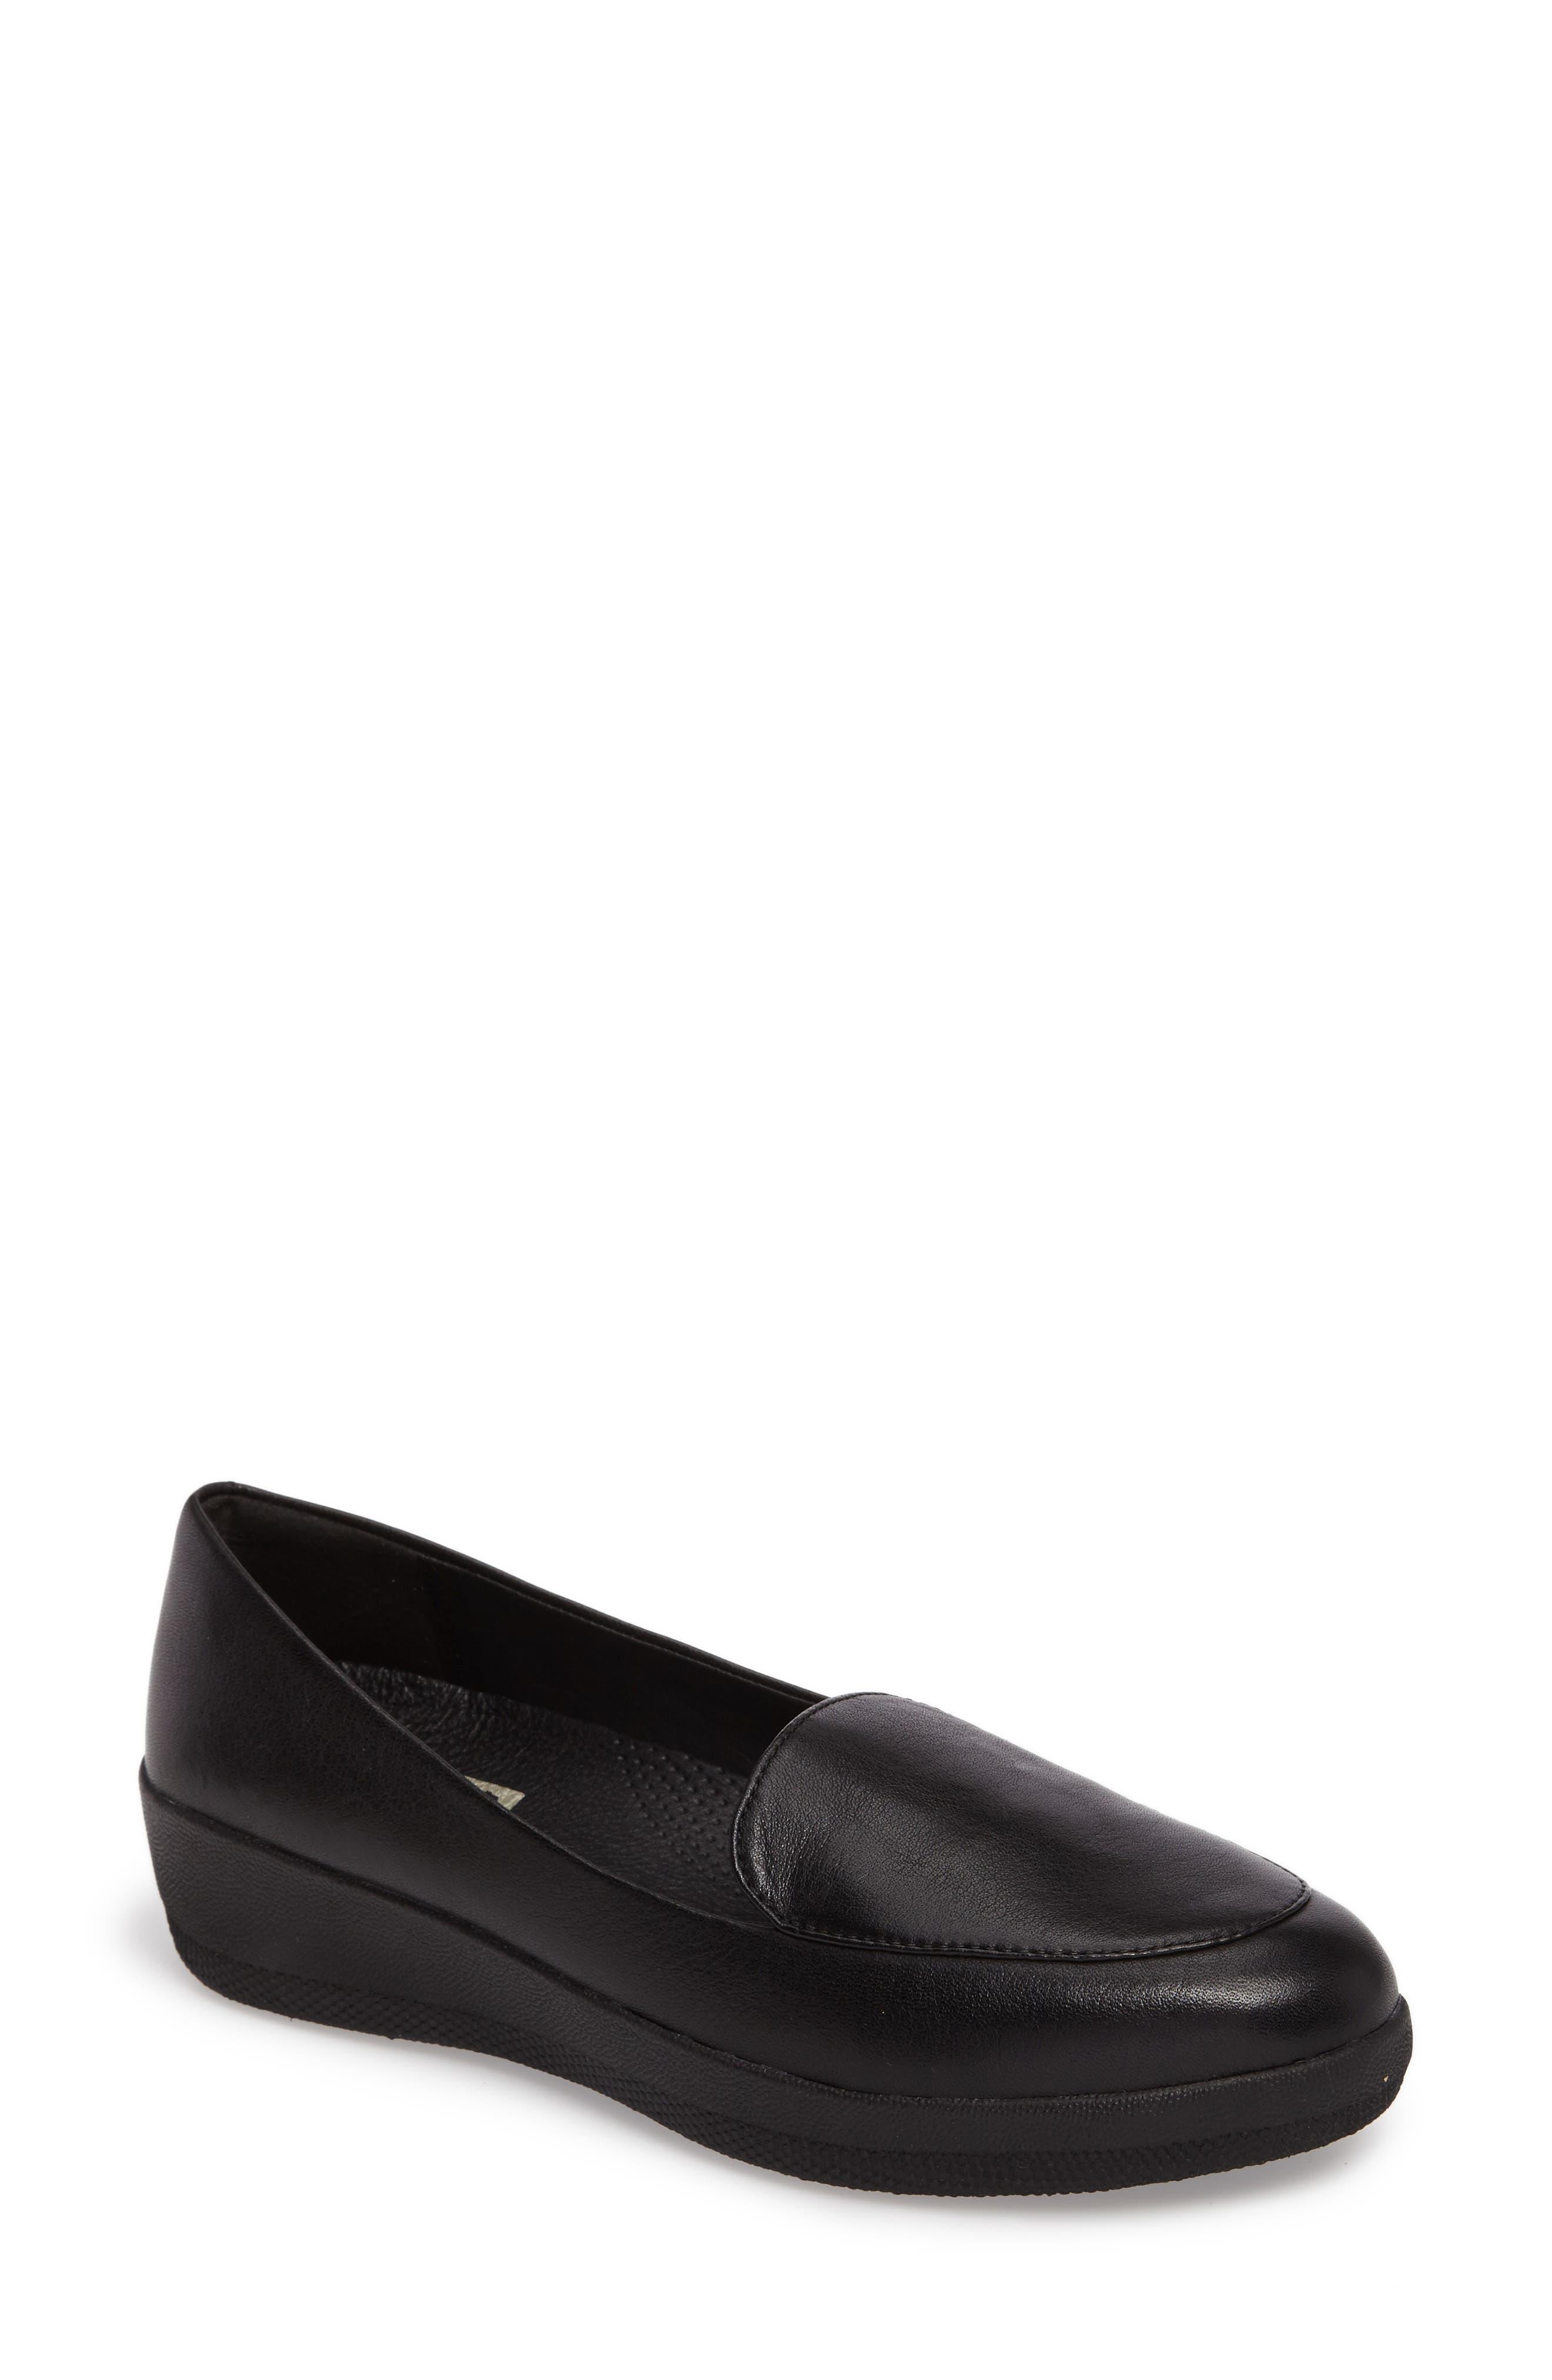 Sneaker Loafer Flat, Main, color, 001